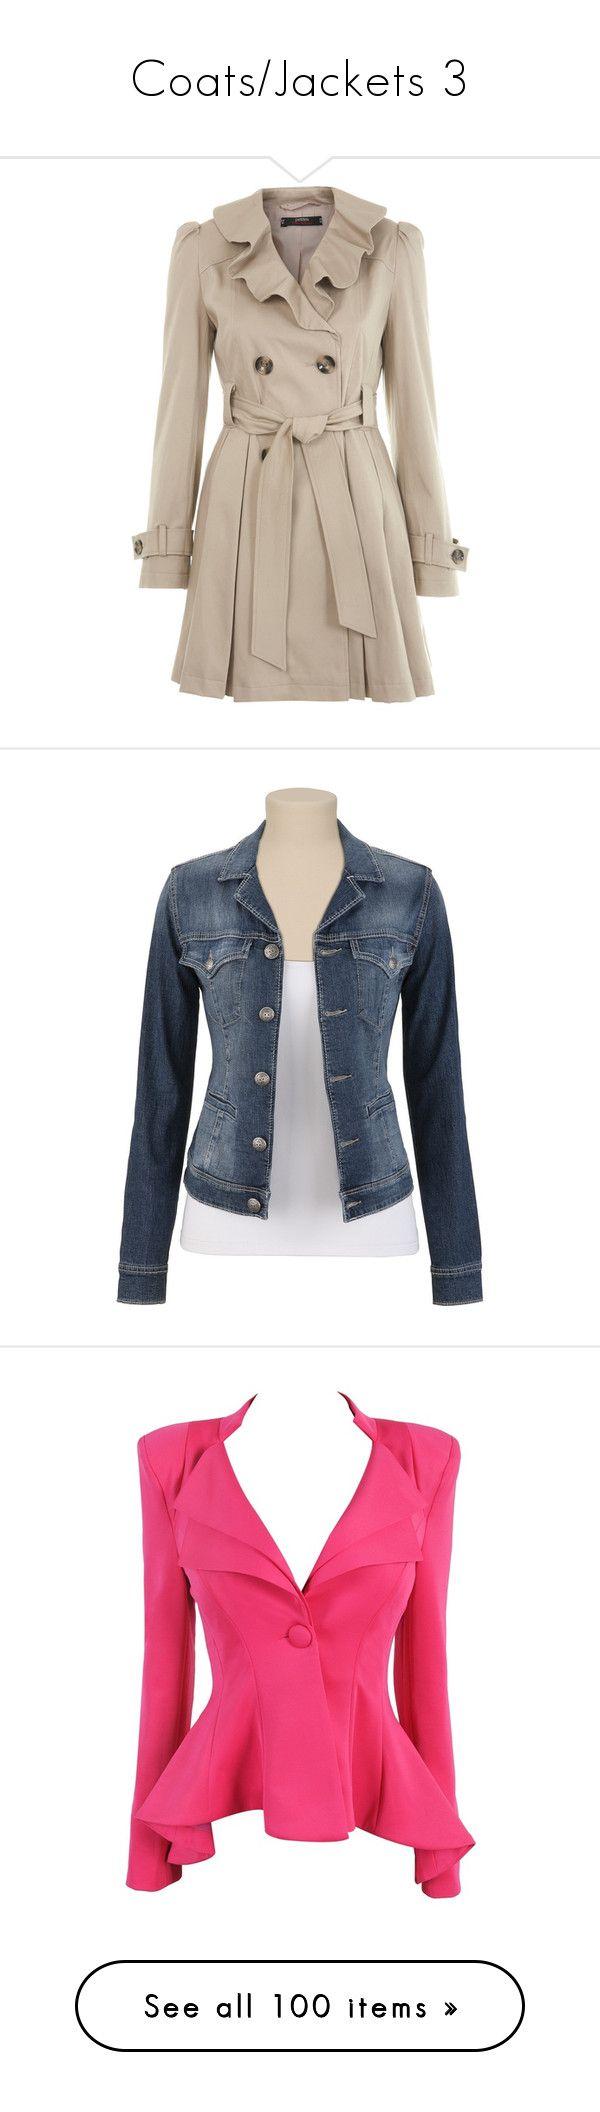 """Coats/Jackets 3"" by singlemom ❤ liked on Polyvore featuring outerwear, coats, jackets, coats & jackets, casacos, mink, pink coat, ruffle coat, pink waist belt and waist belt"